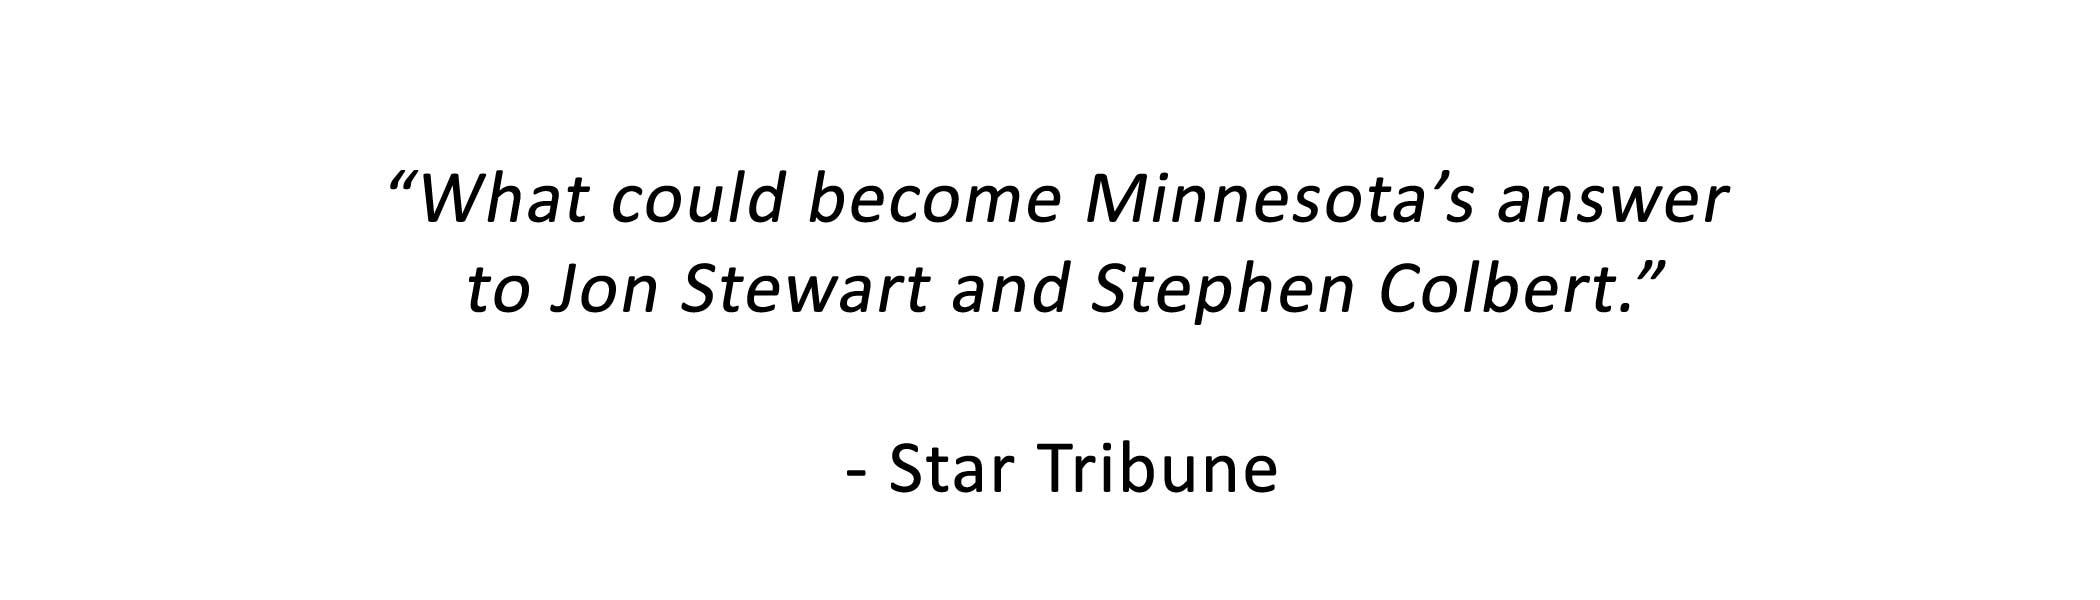 Star-Tribune.jpg